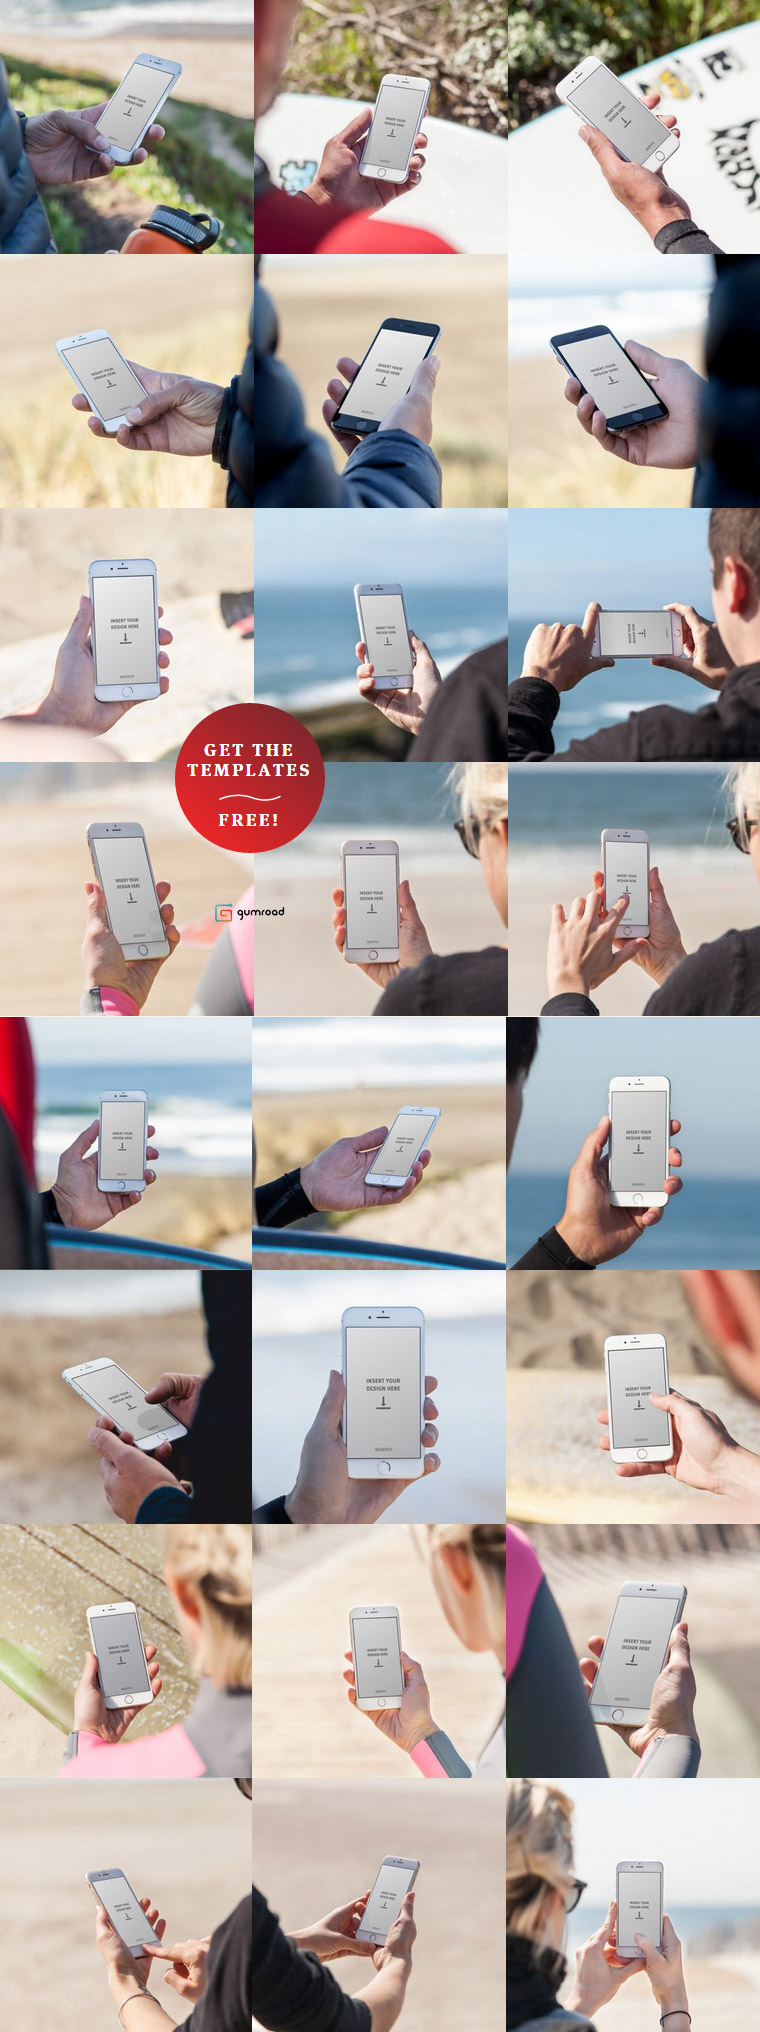 free-iphone-6-templates